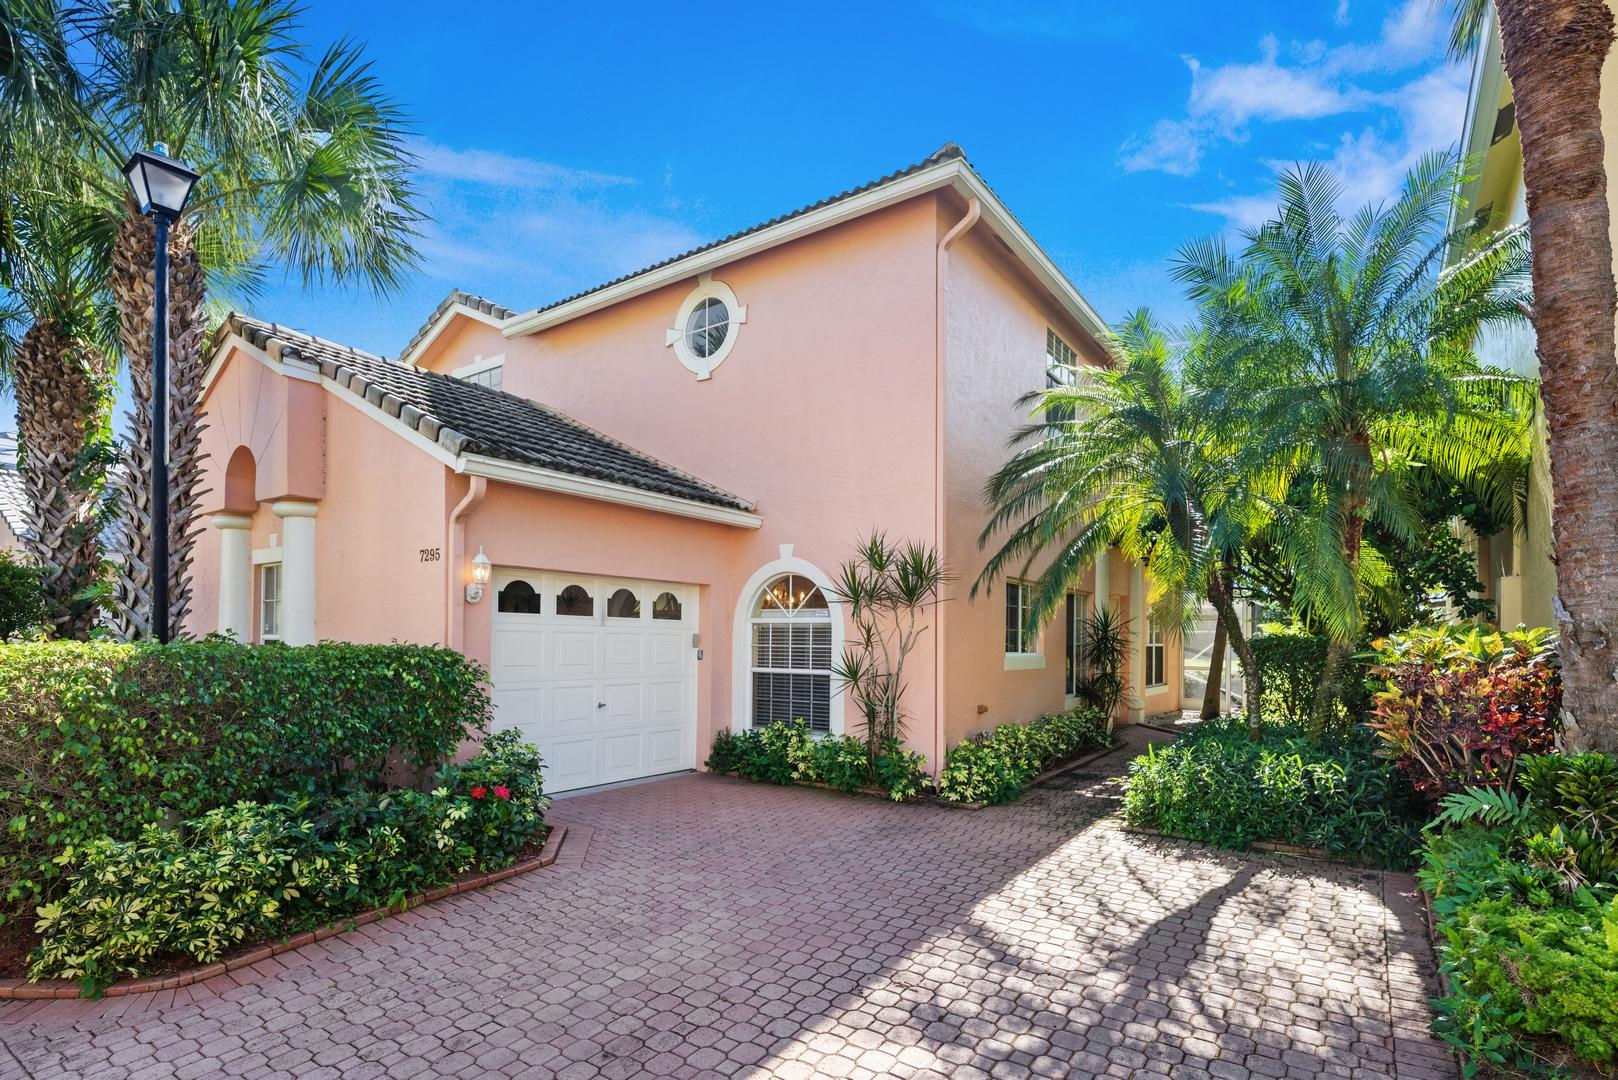 7295 Panache Way Boca Raton, FL 33433